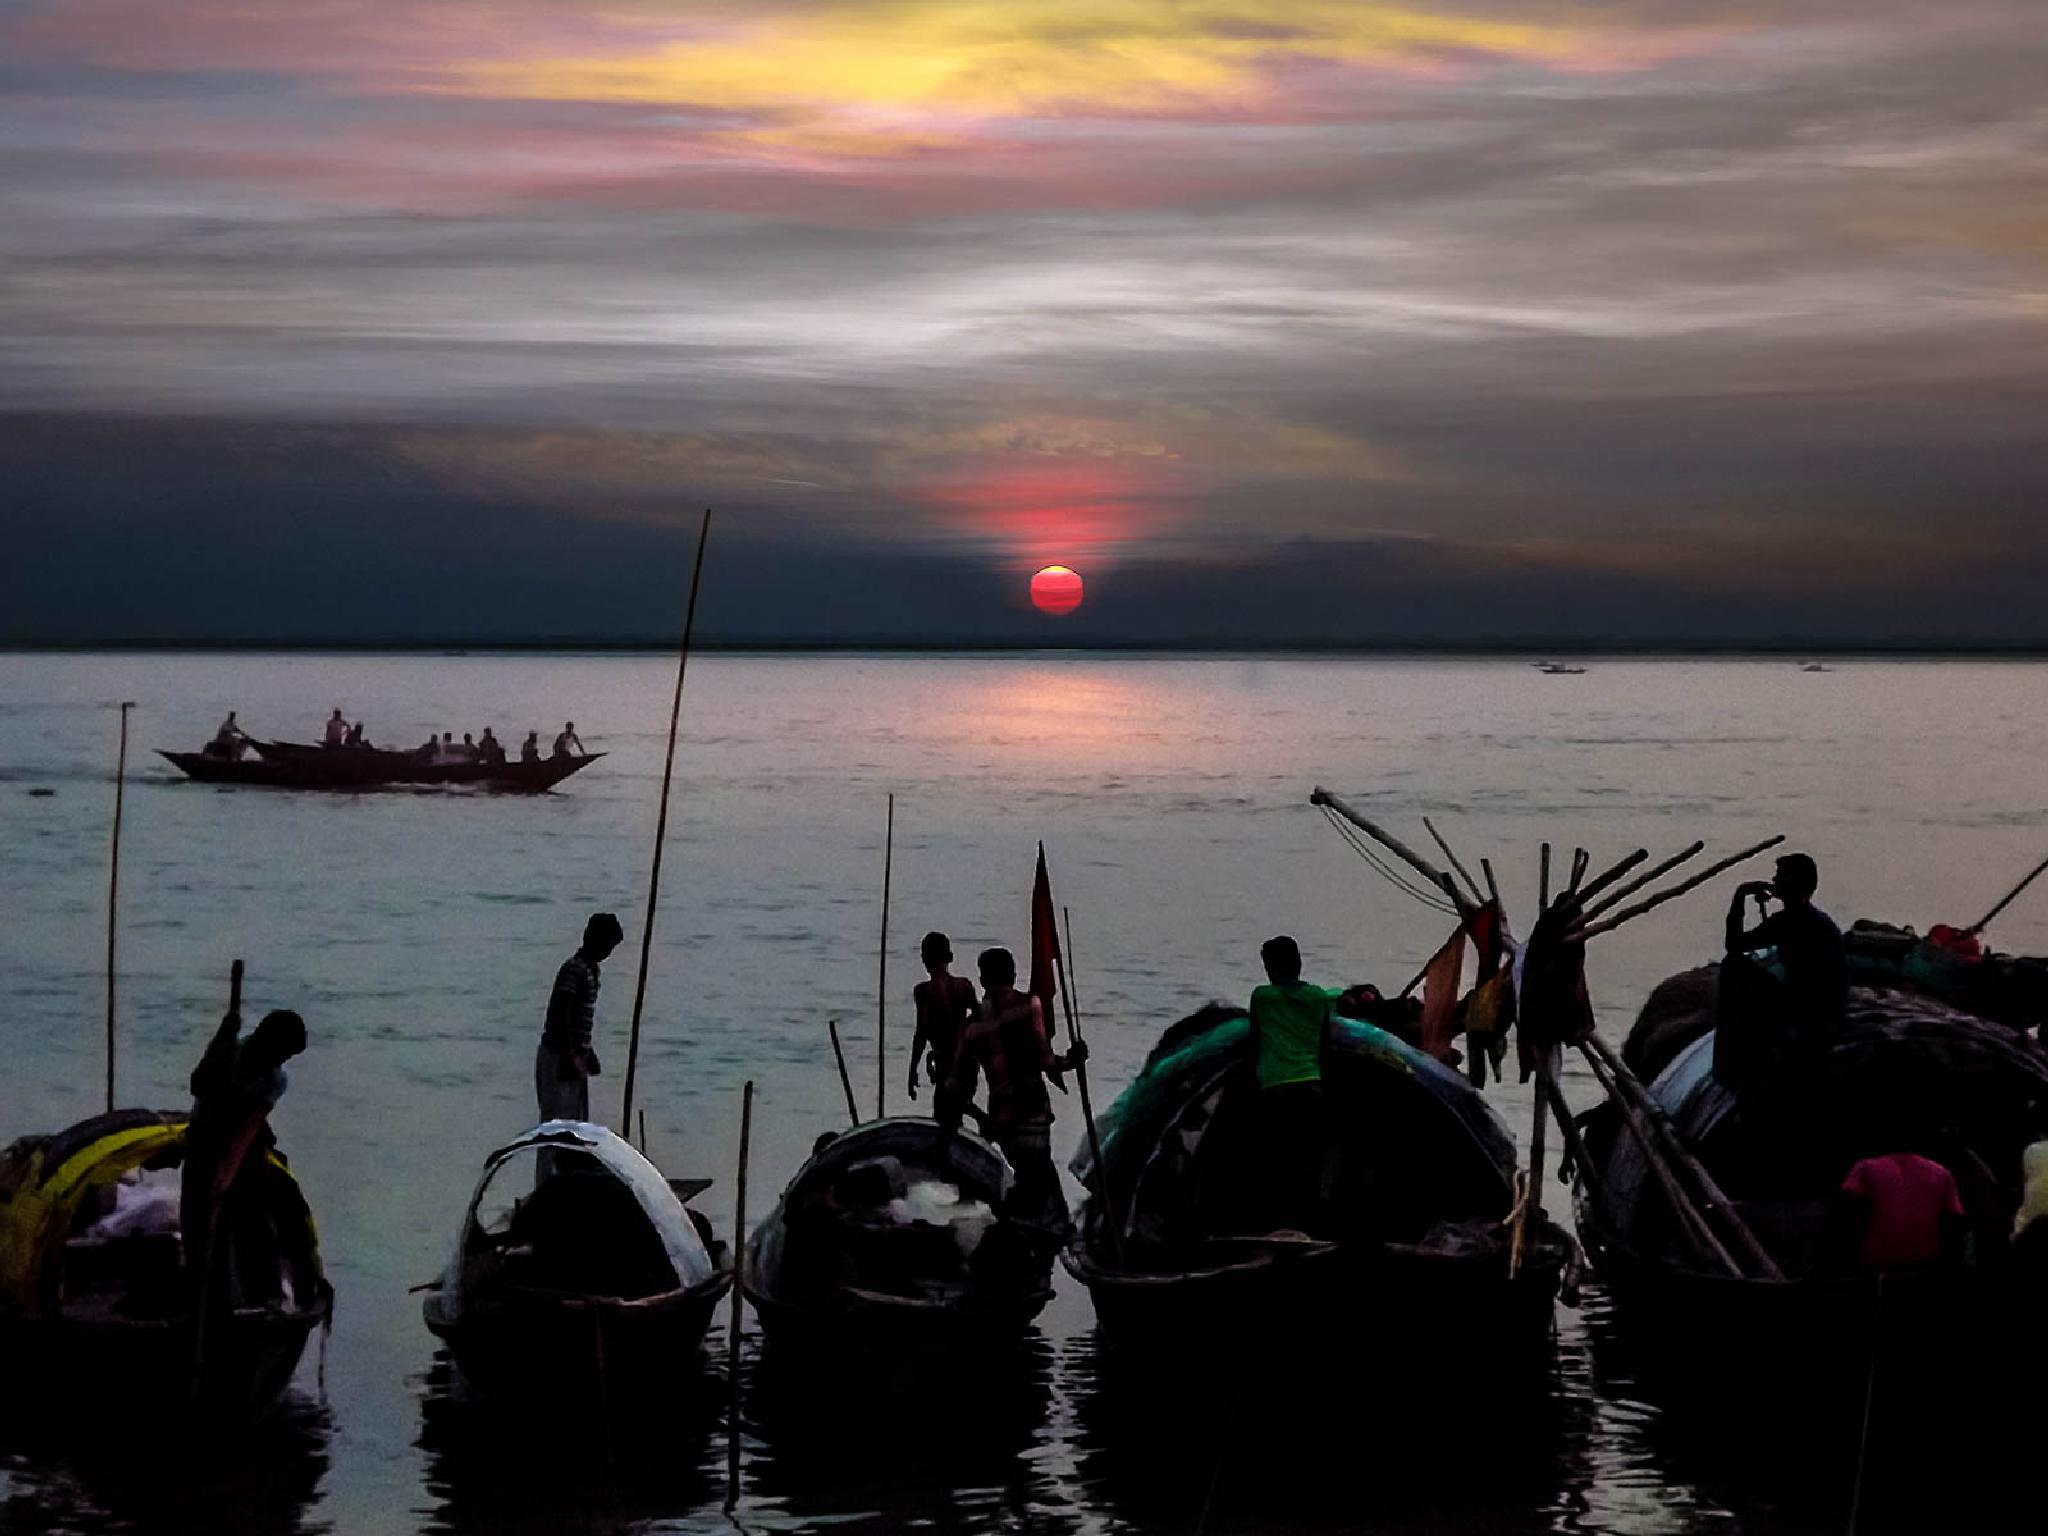 Fishermen-Bank of River Padma-0291 by ЯΔJJIБ'S PЂØŦØ